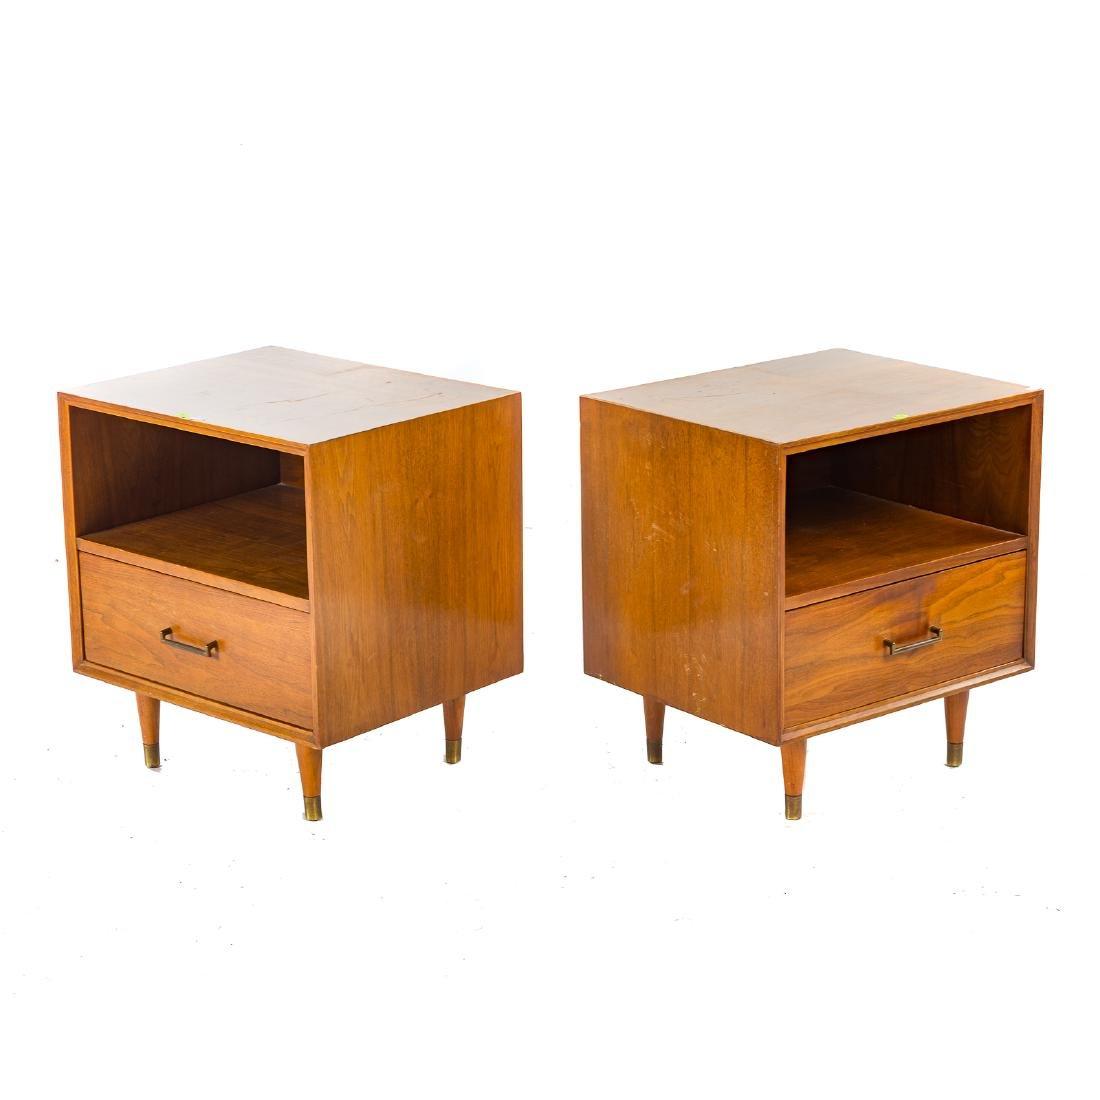 Pair of Furnette Walnut Nightstands - 2